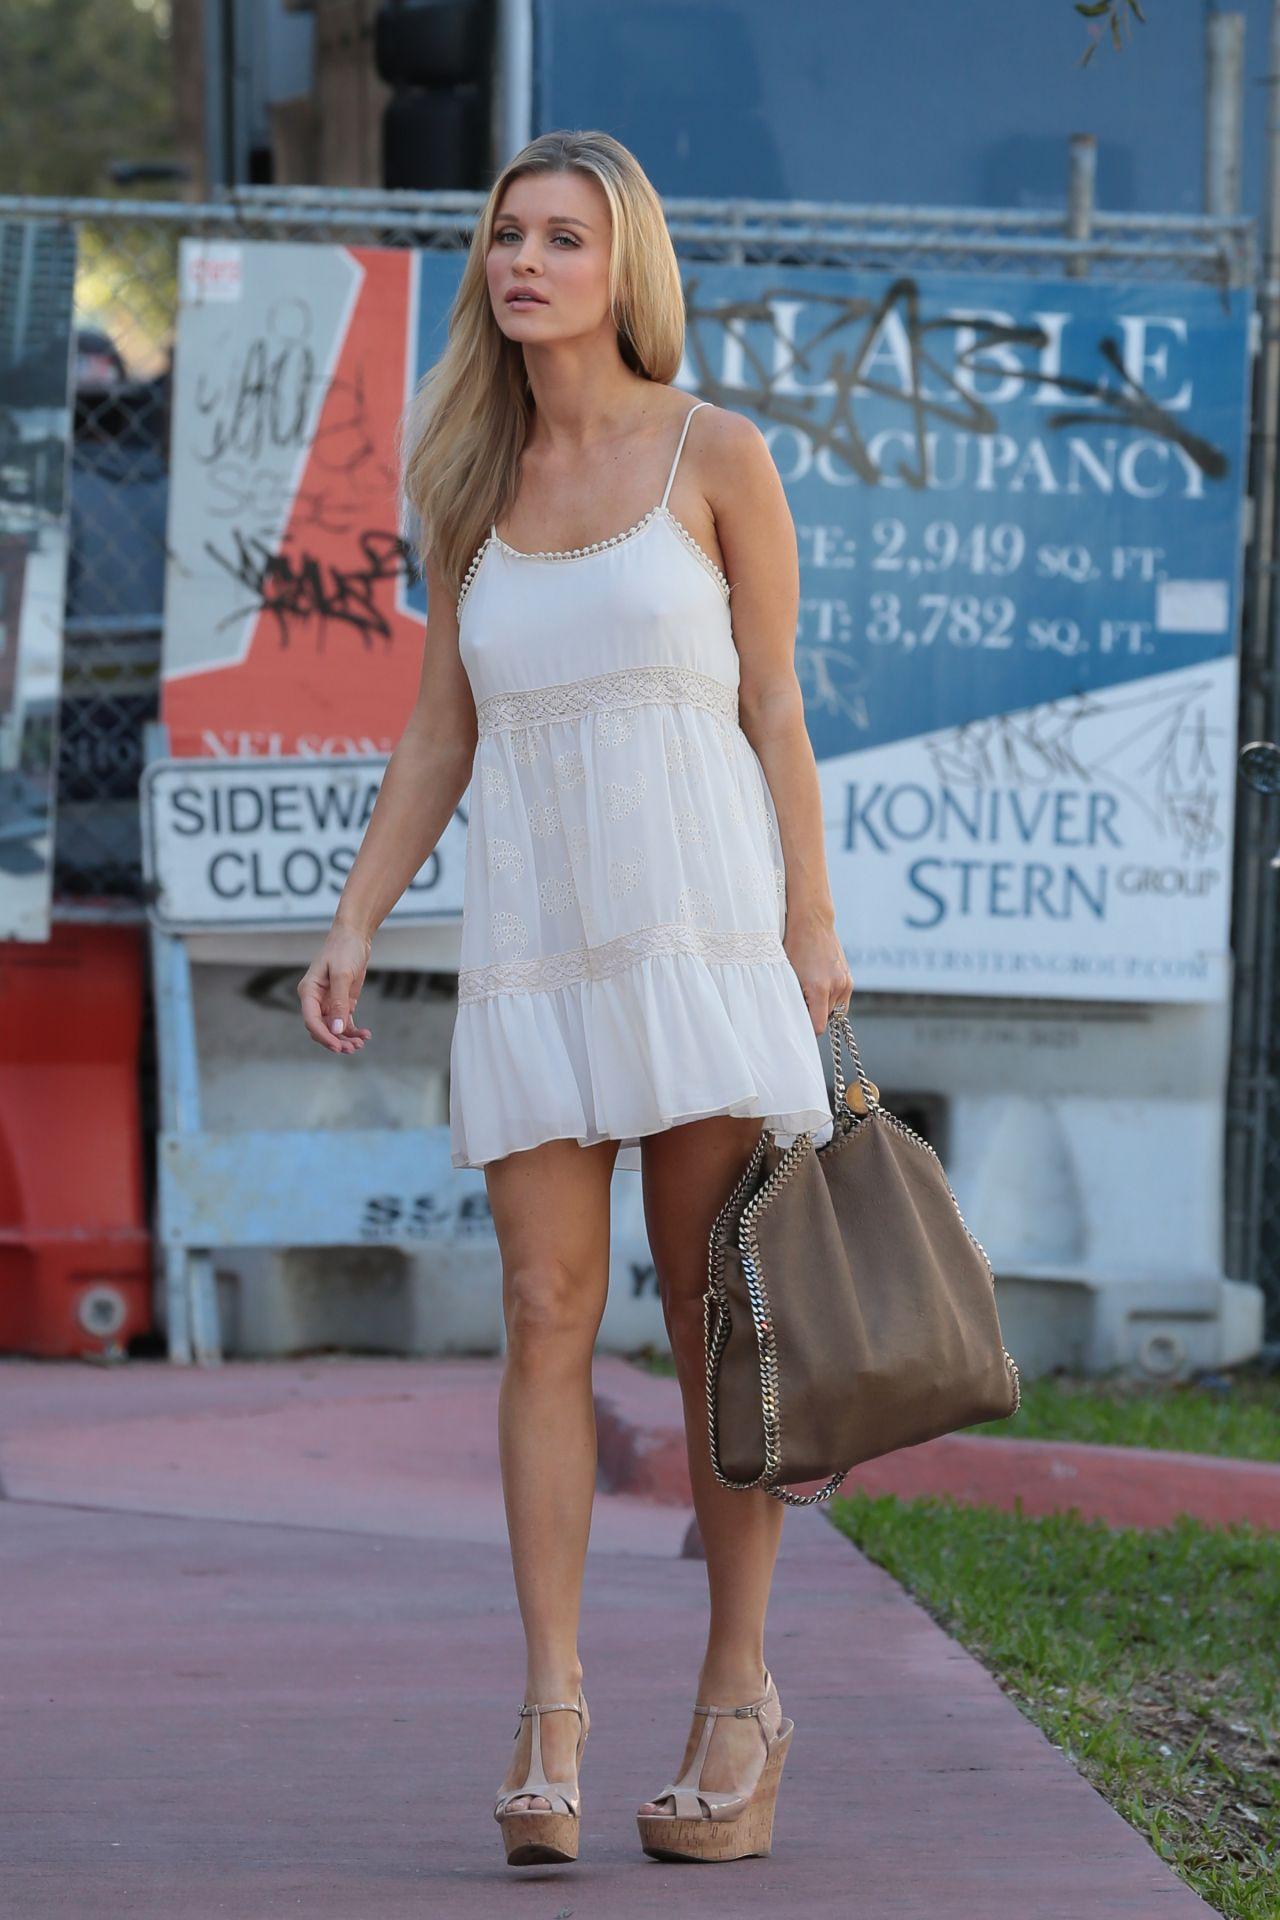 Joanna Krupa In White Mini Dress Out In Miami February 2014